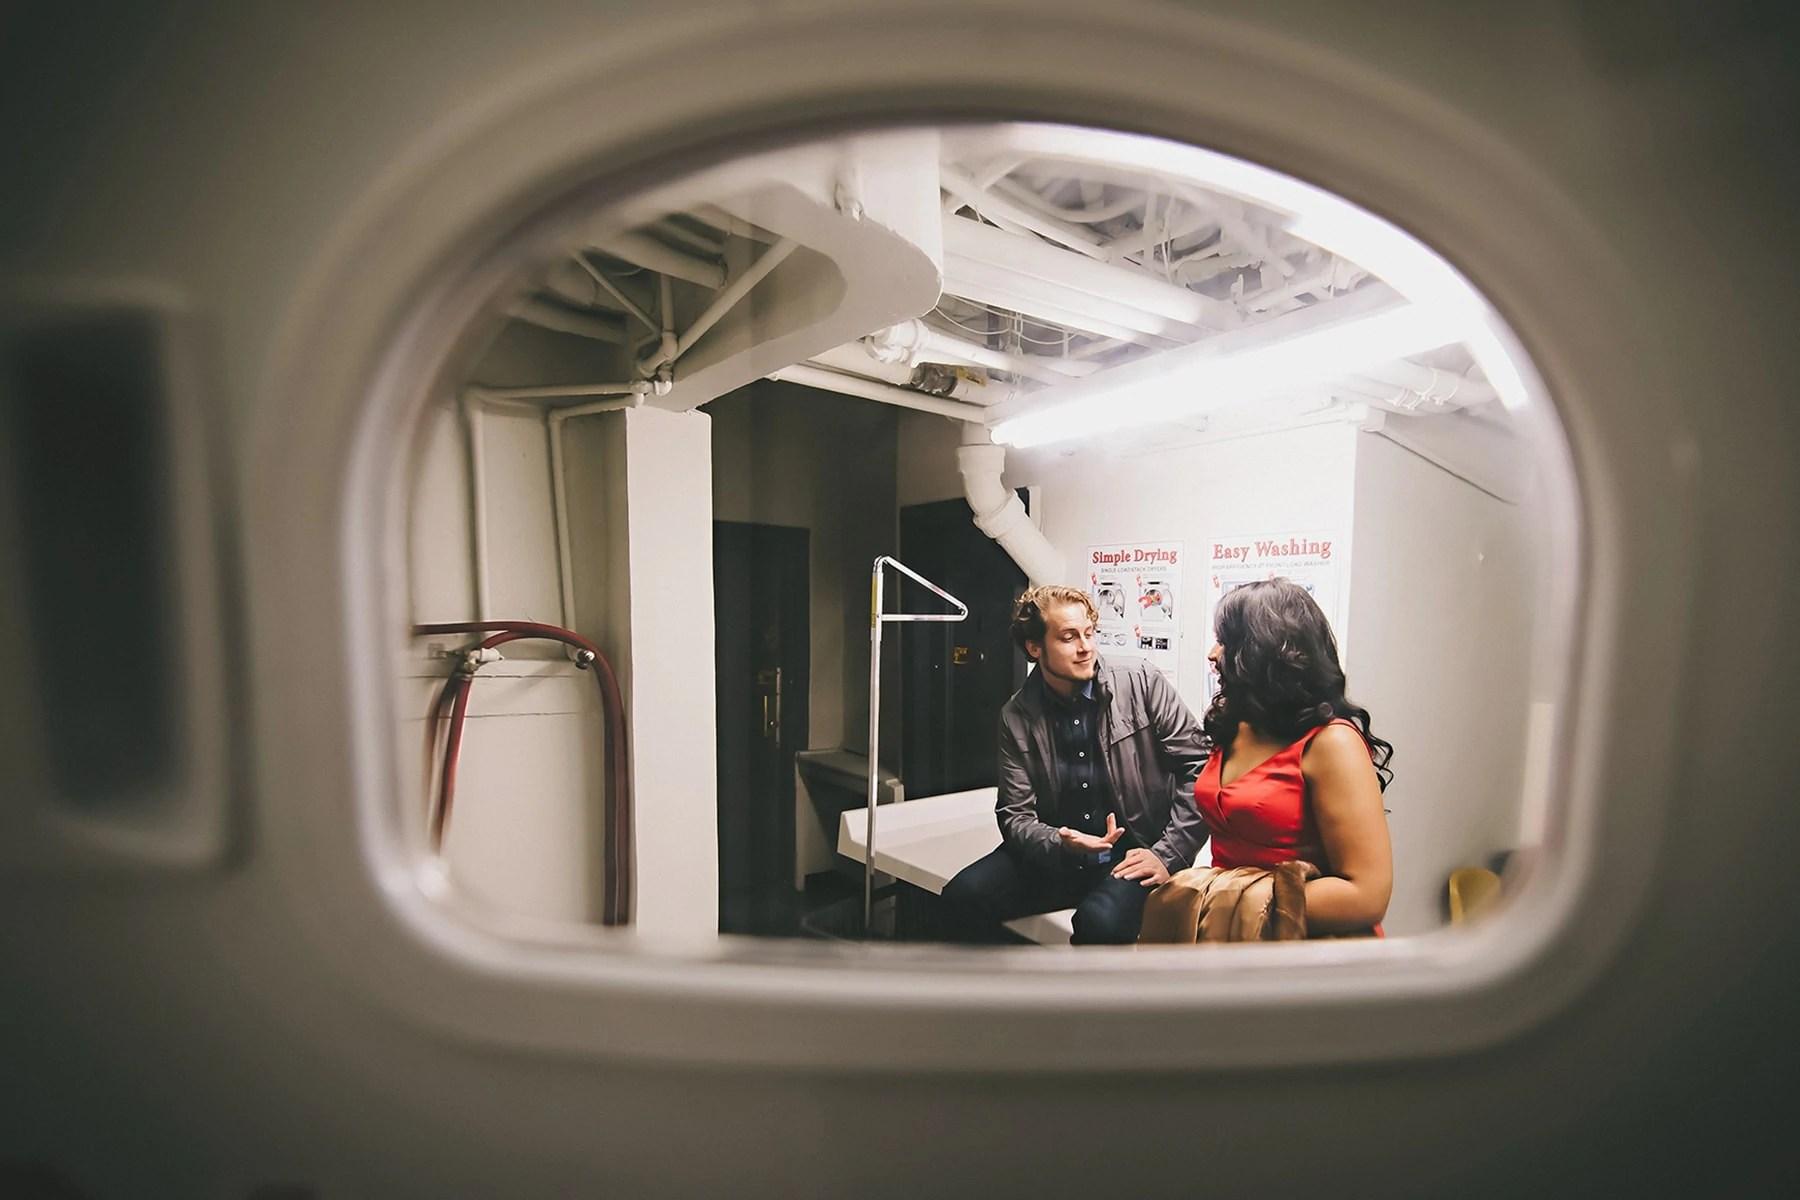 laundry room engagement session - Manhattan - NYC- Soulmates Studio